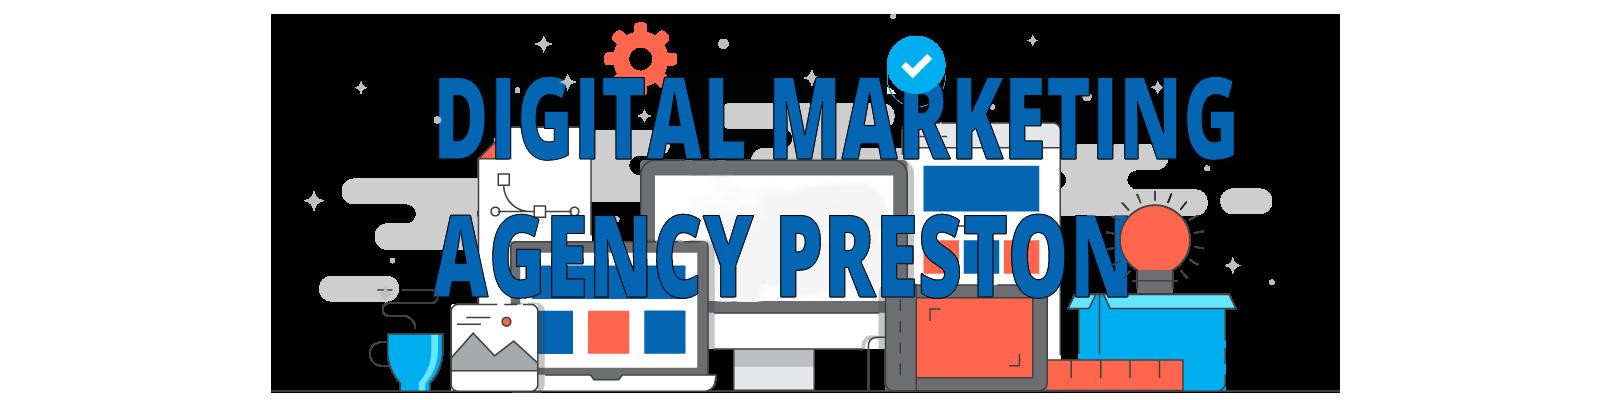 seek social digital marketing agency preston header with transparent background